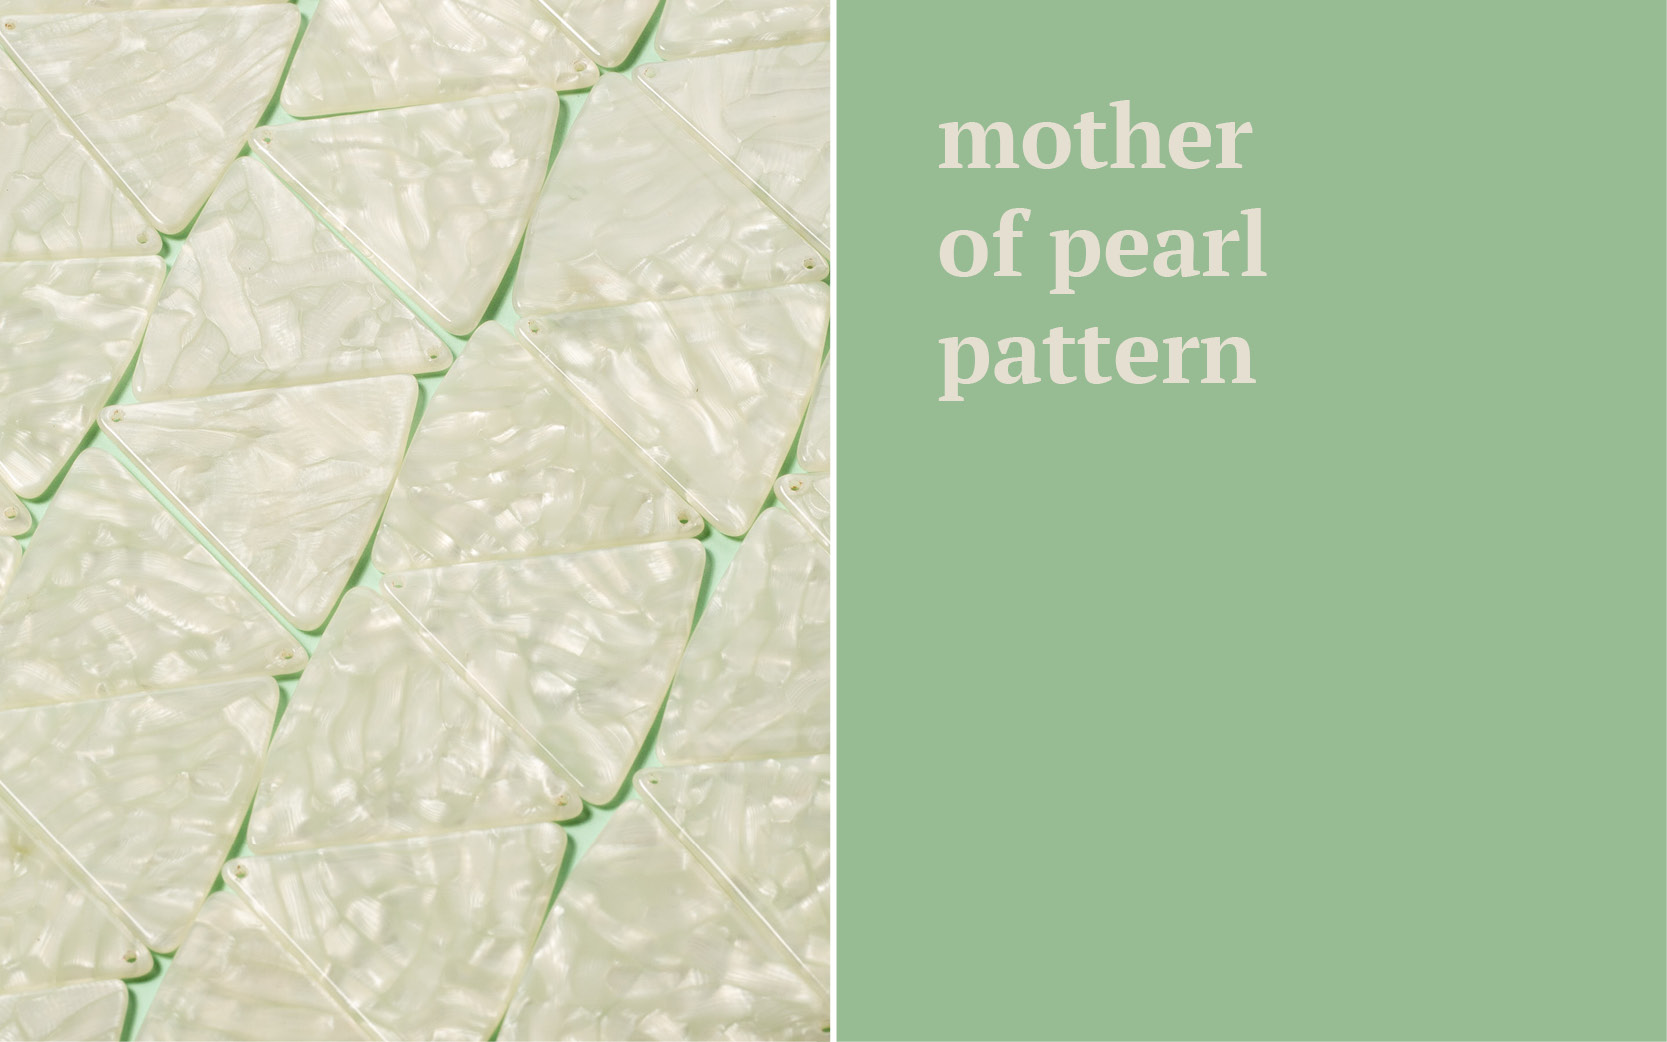 mother-pf-pearl-pattern.jpg